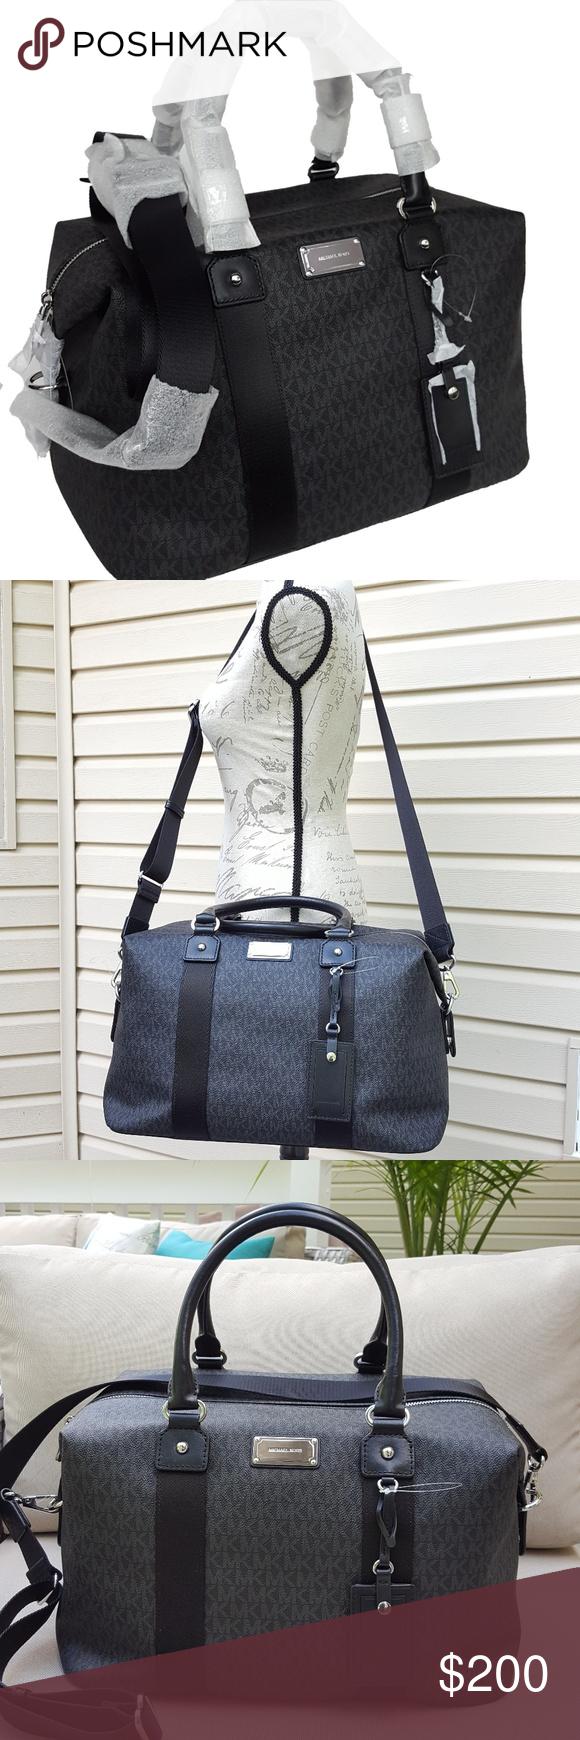 5a104827b6153 NWT Michael Kors LG travel bag weekender black MK 100% guaranteed authentic  NWT Michael Kors